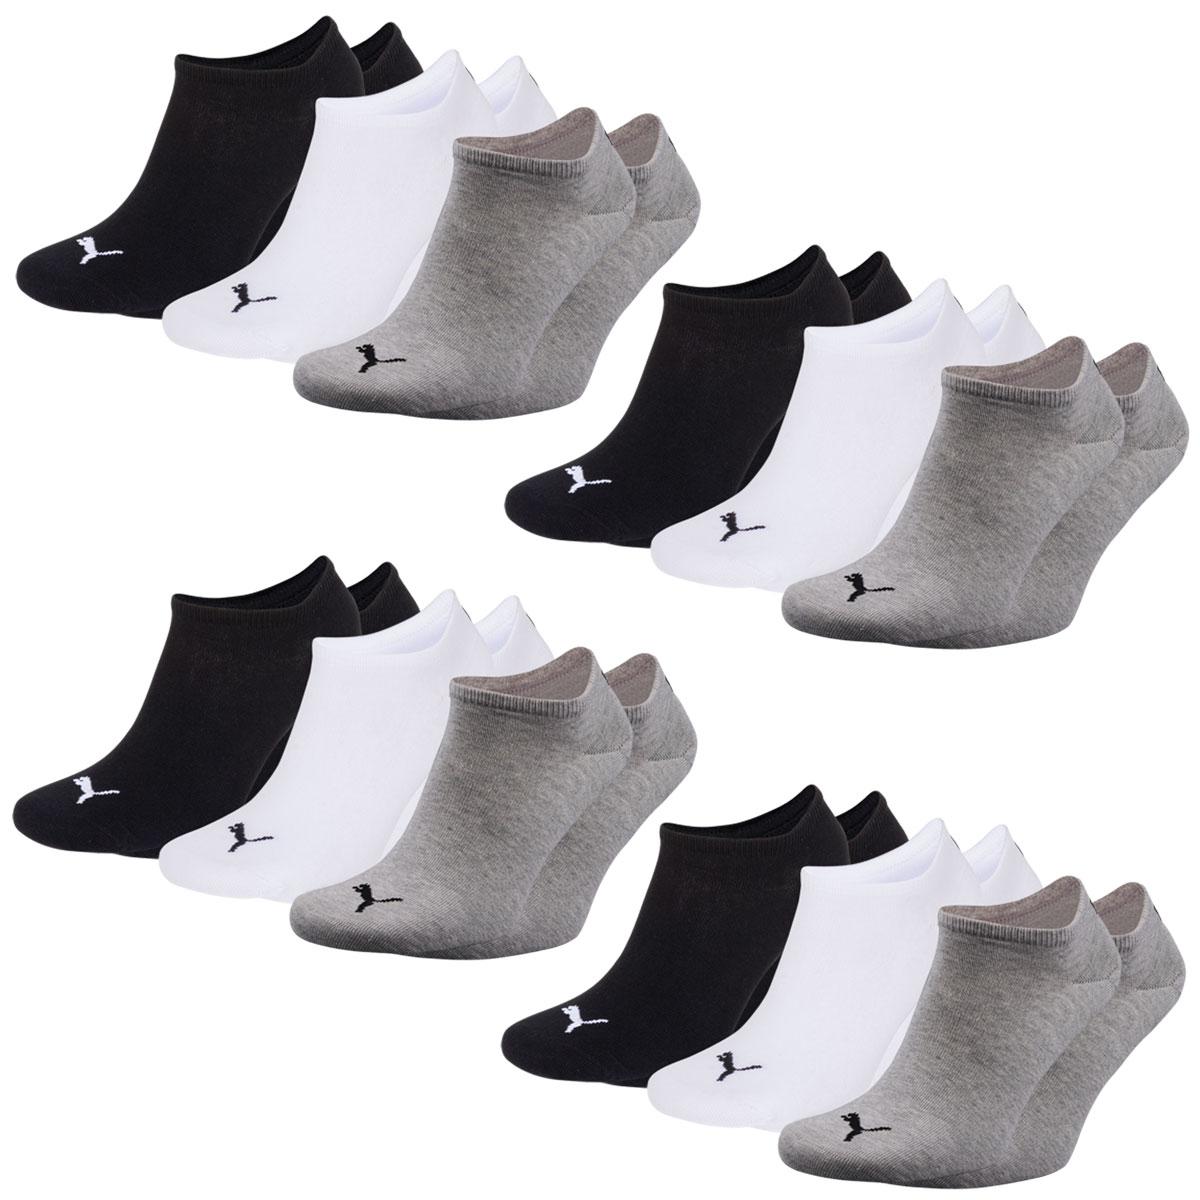 12 Paar Puma Füsslinge, Sneaker, schwarz, weiß, grau